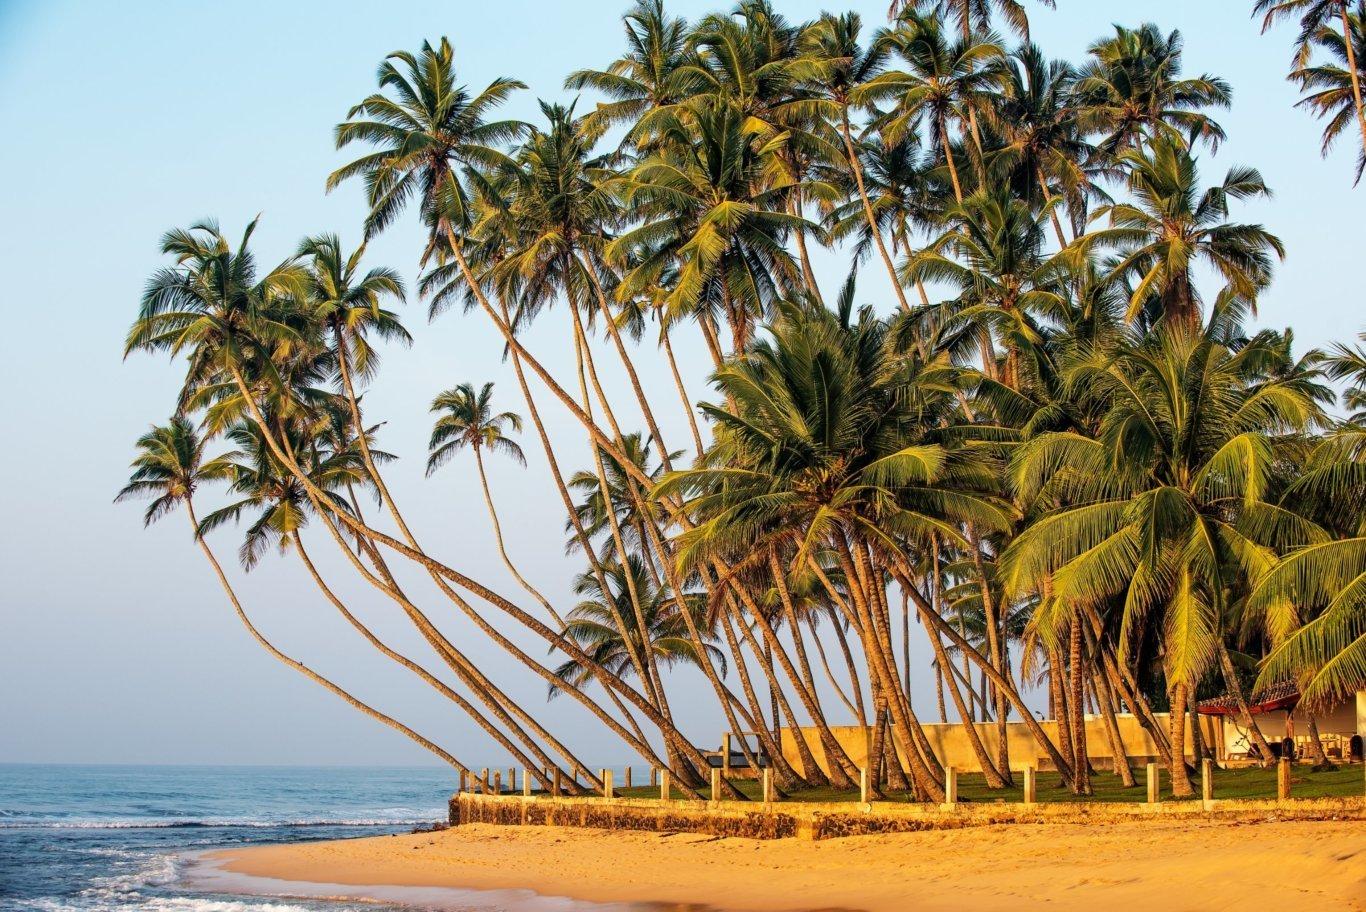 7-Day Island Indulgence in Sri Lanka - Sri Lanka Itinerary